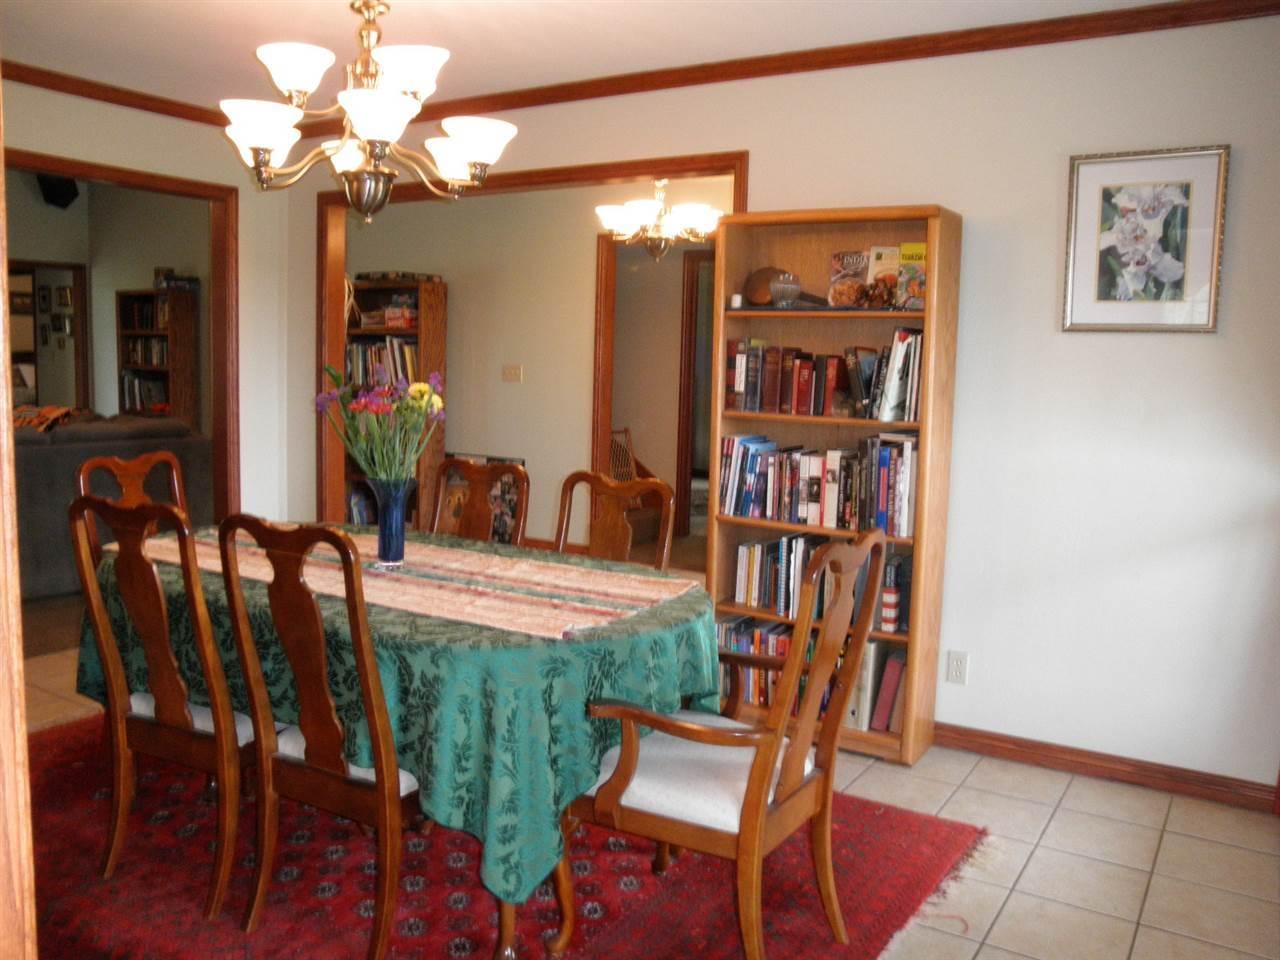 Sold Intraoffice W/MLS | 6855 Lake Road  Ponca City, OK 74604 7